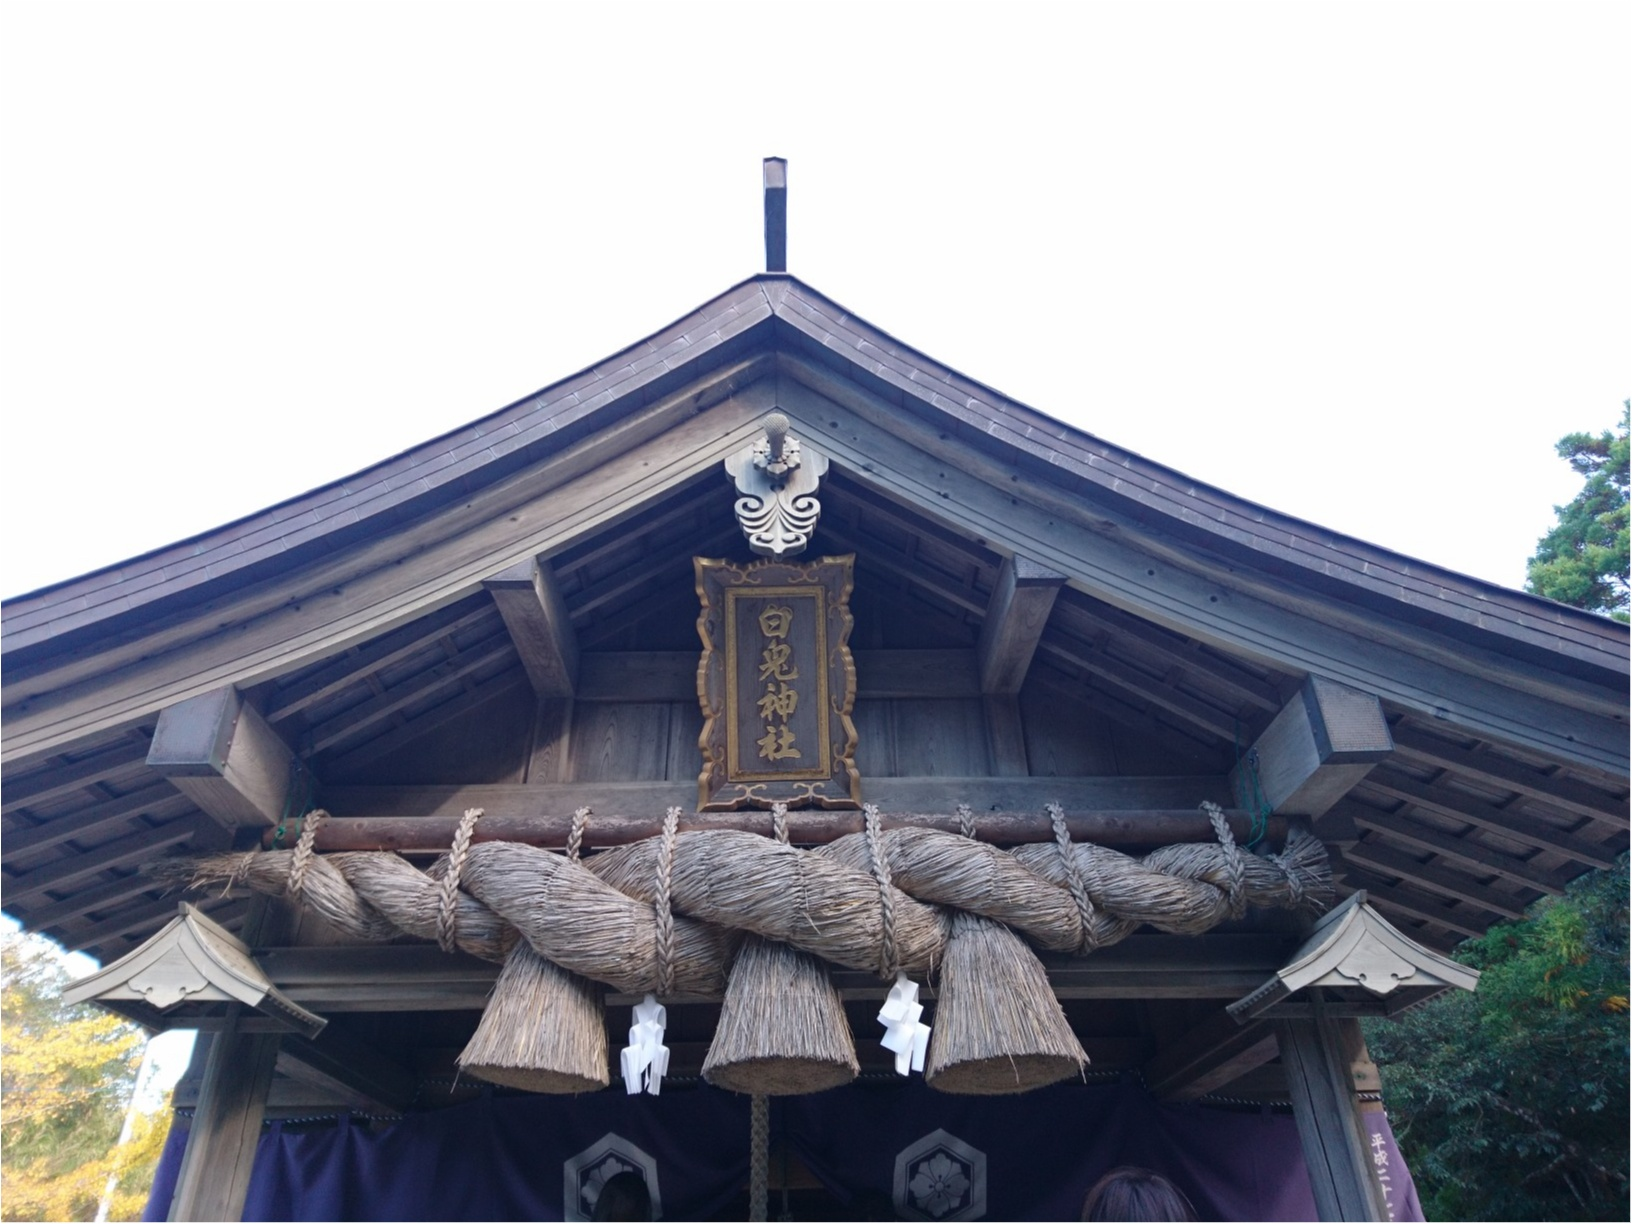 ≪関西・日帰り旅行≫鳥取旅 最後は神話&恋人の聖地で健康・良縁祈願☆ _2